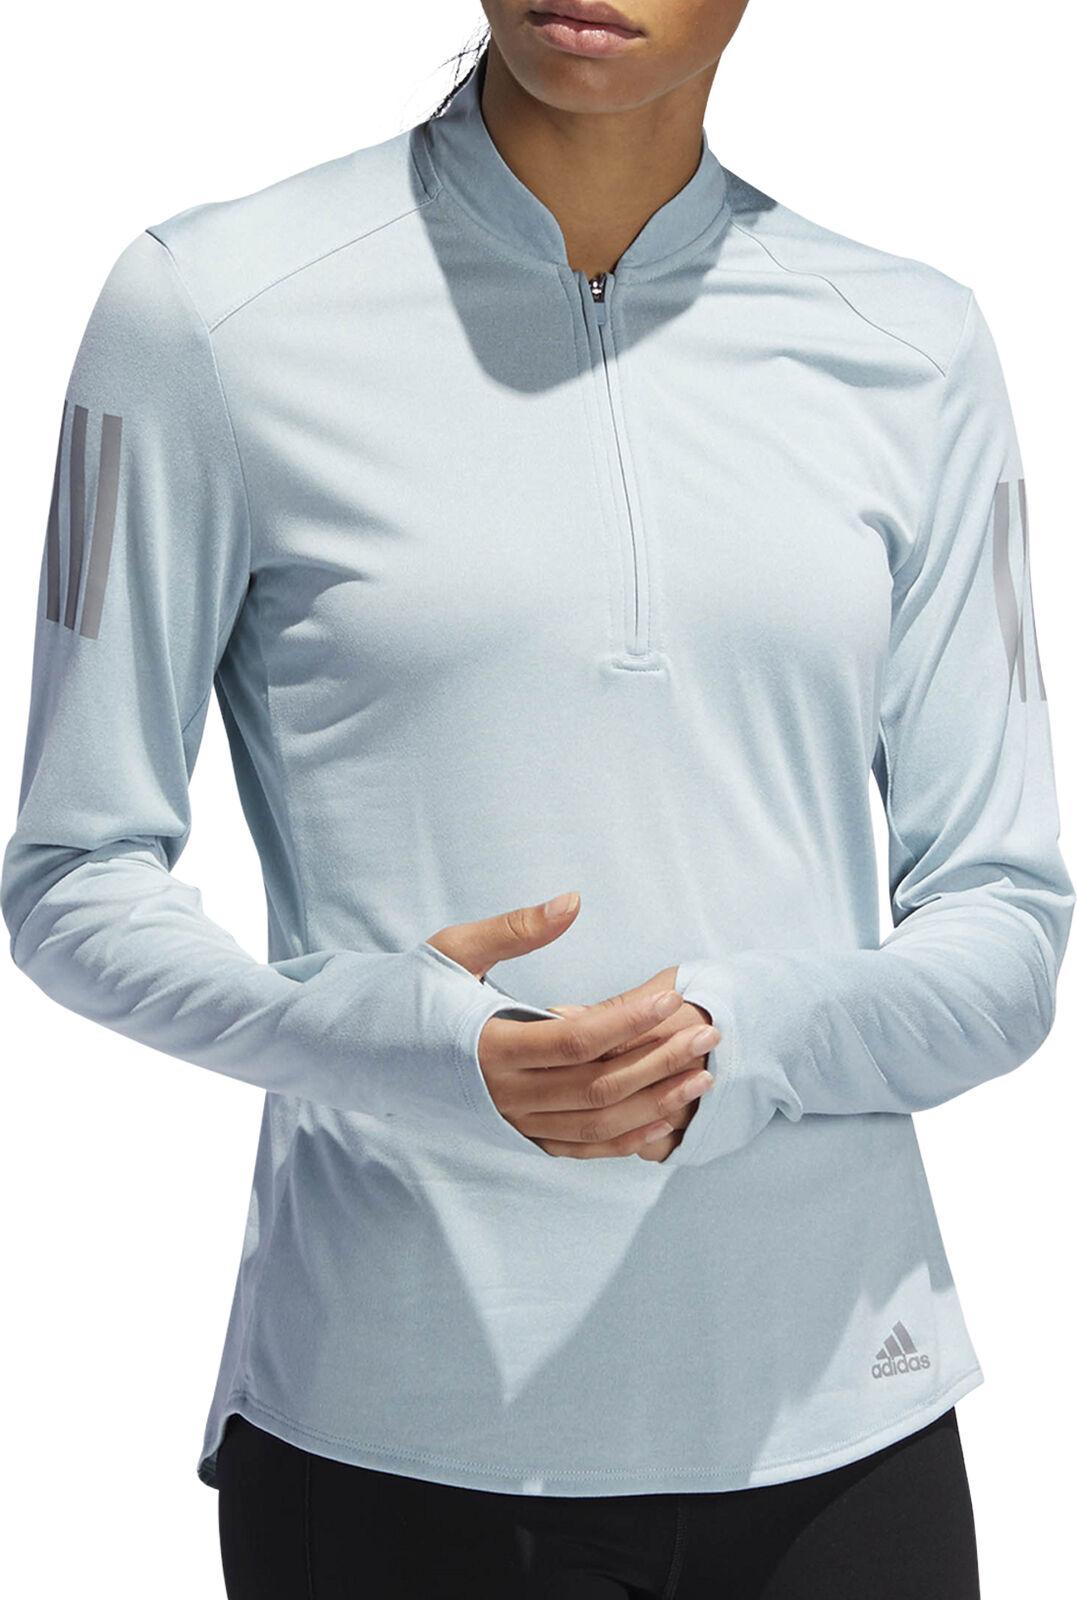 Adidas Own The Run Half Zip Long Sleeve Womens Running Top - bluee